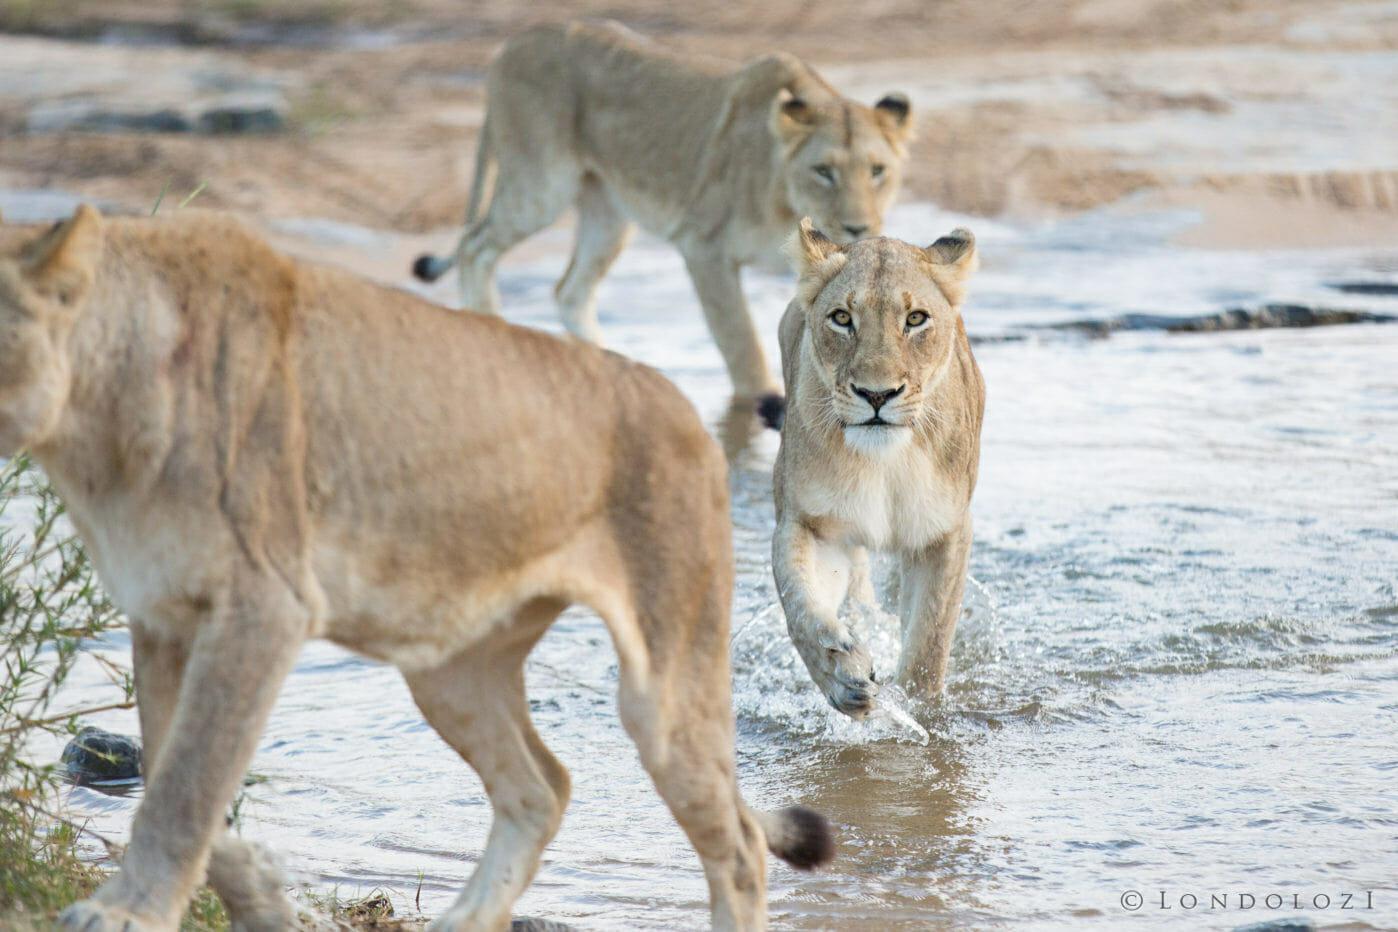 Mhangeni Lioness Cross Sand River Jt